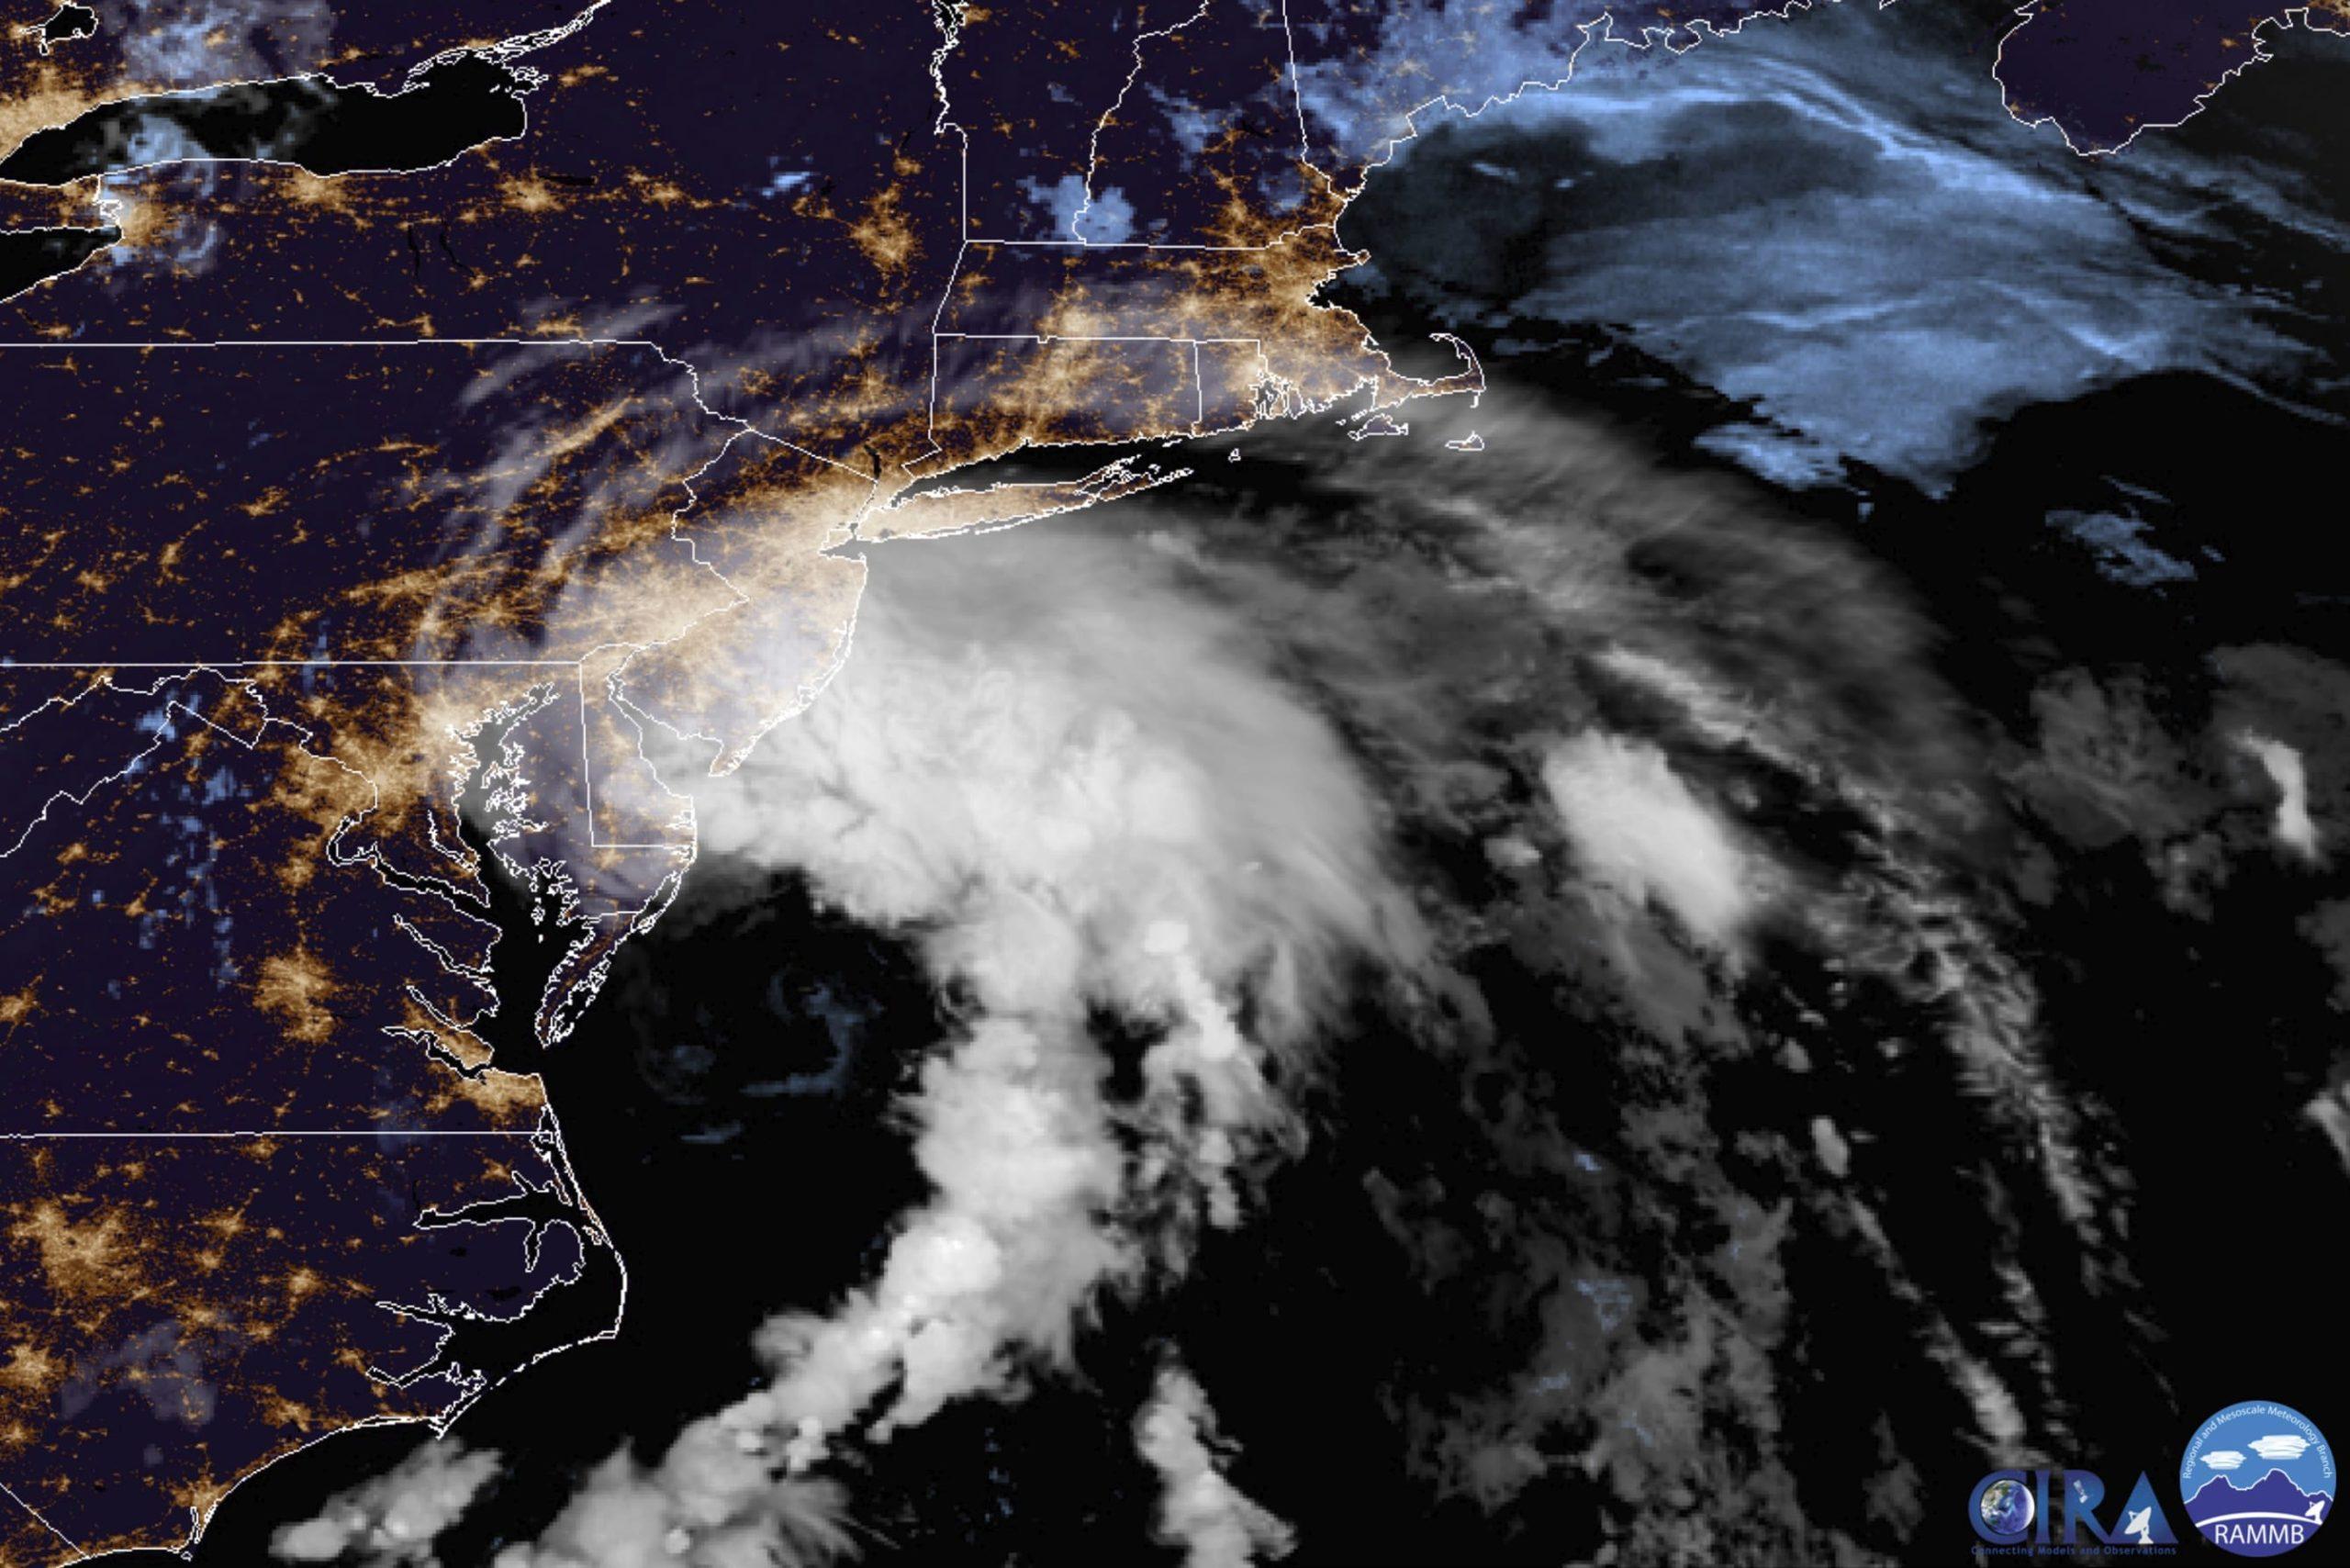 Tropical Storm Fay strikes nearer to mid-Atlantic, New England